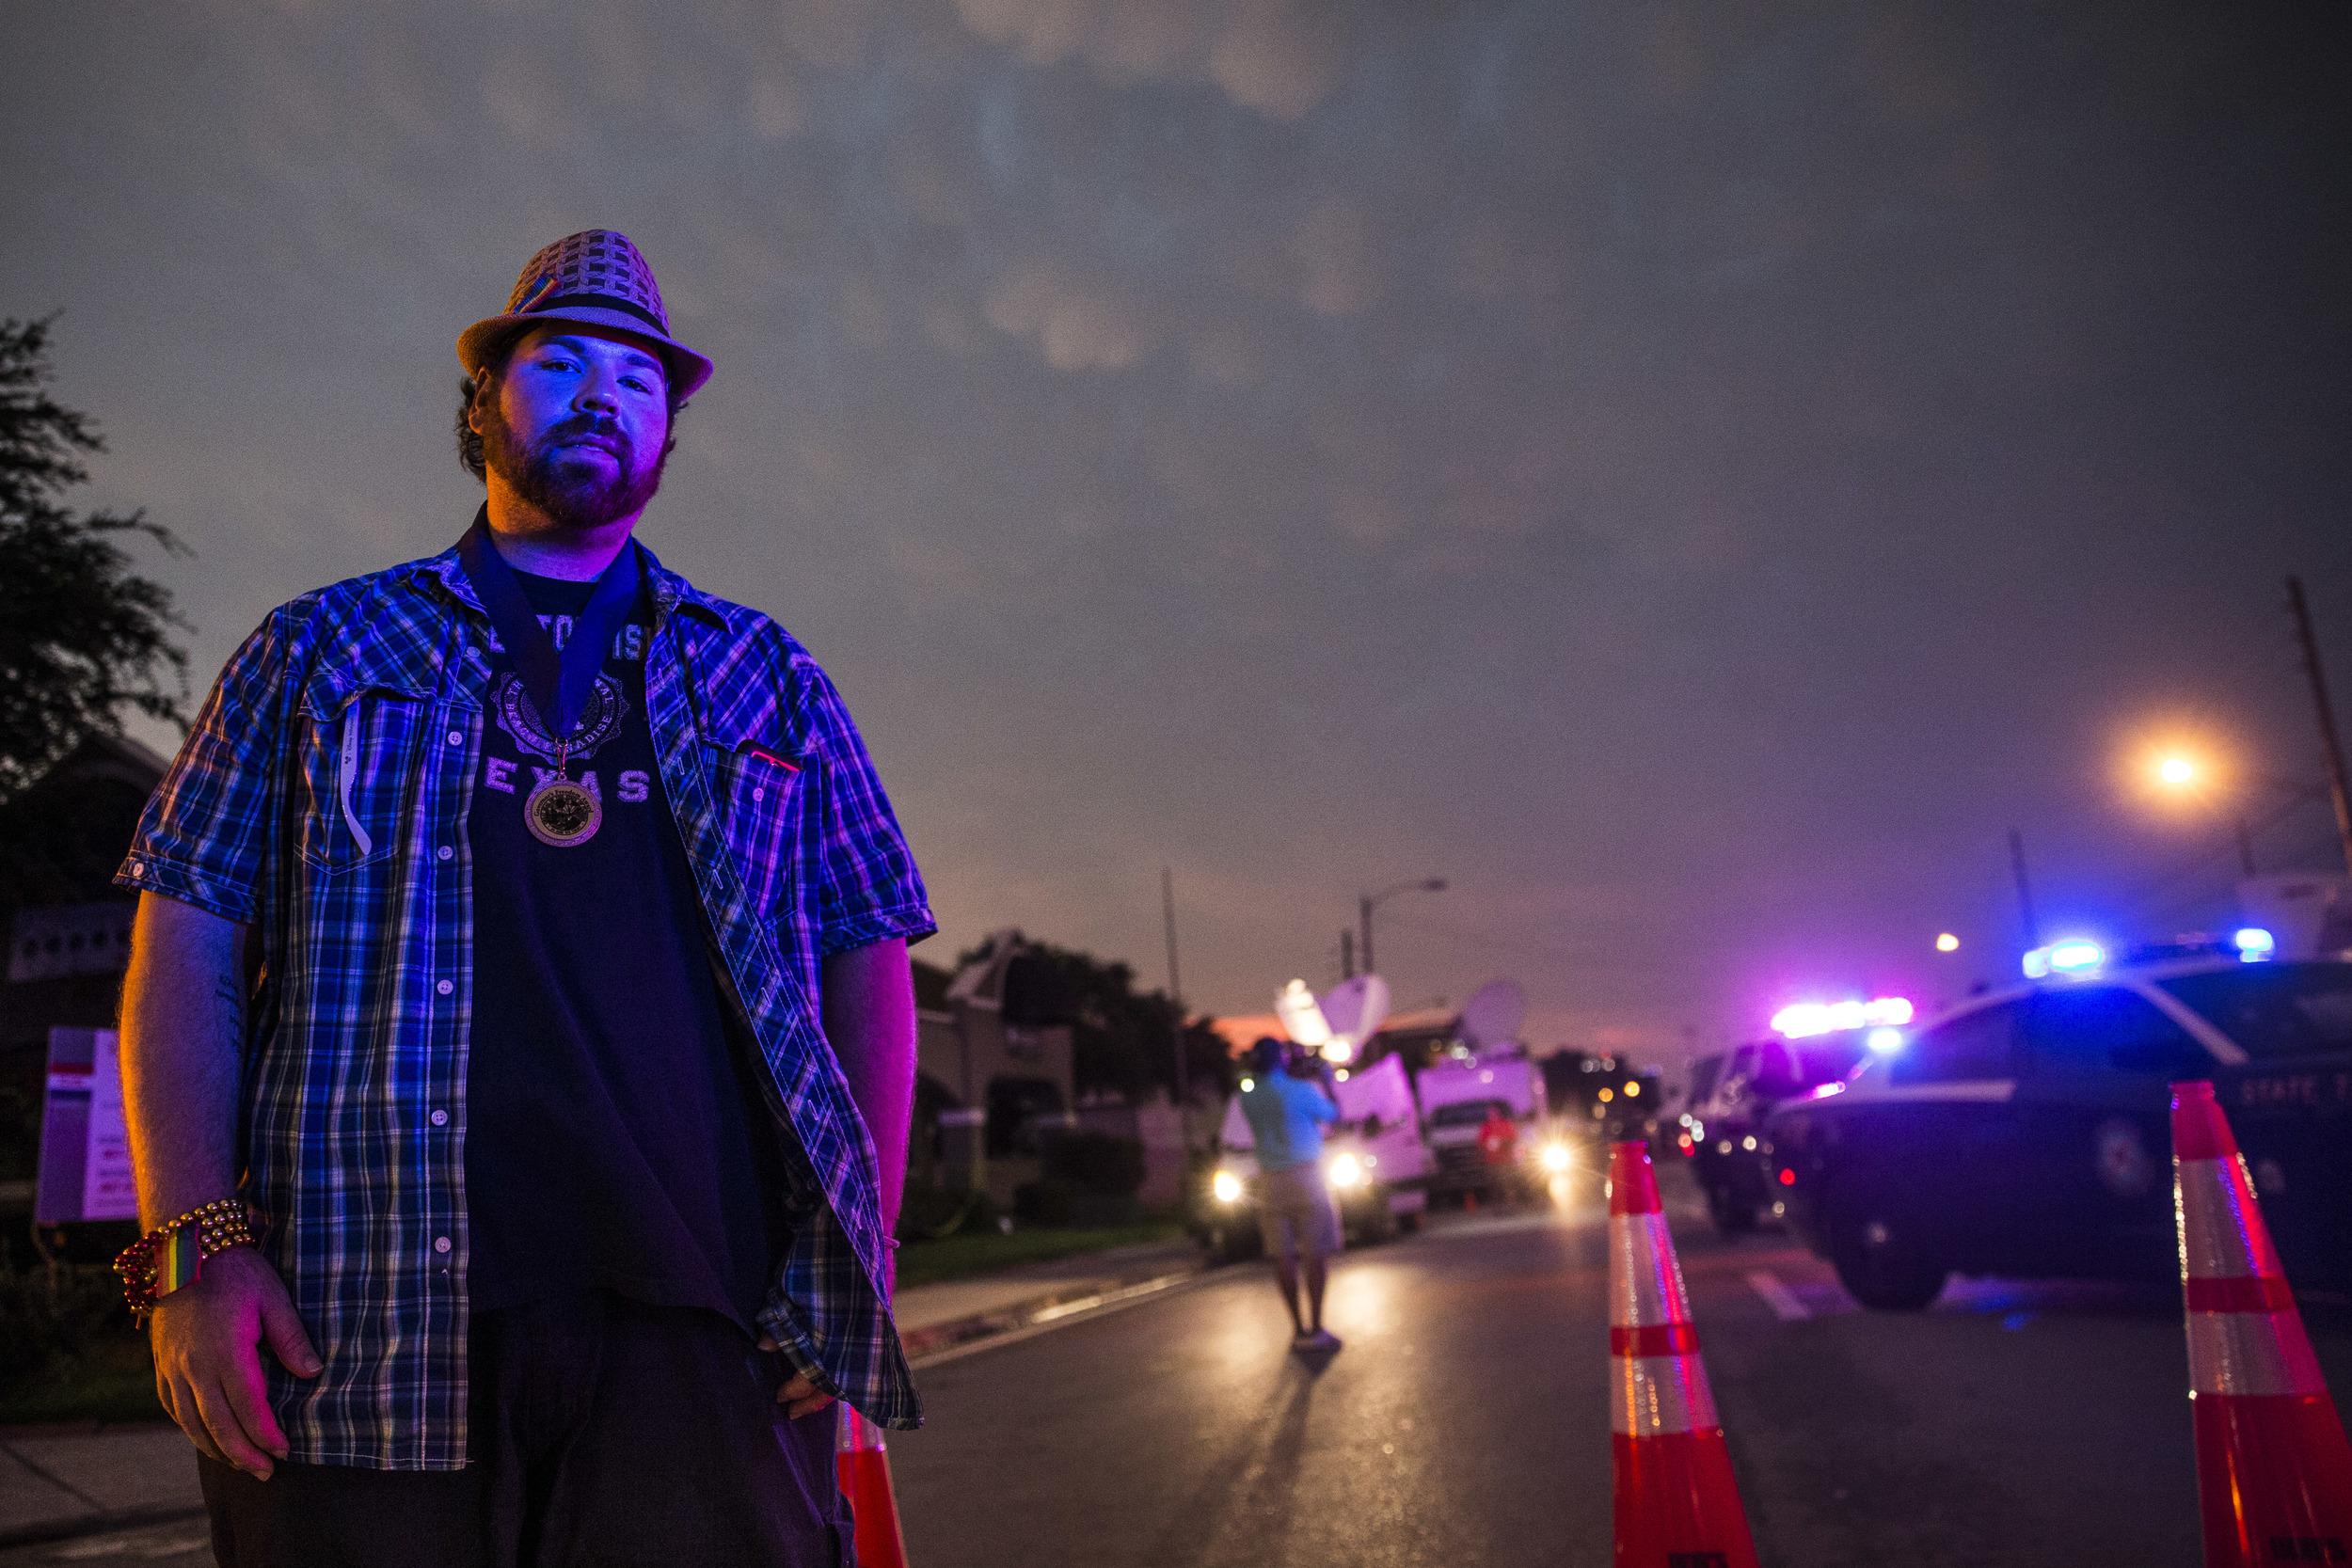 Chritopher Harris, Orlando gay club shooting survivor, came back to a tragedy's site